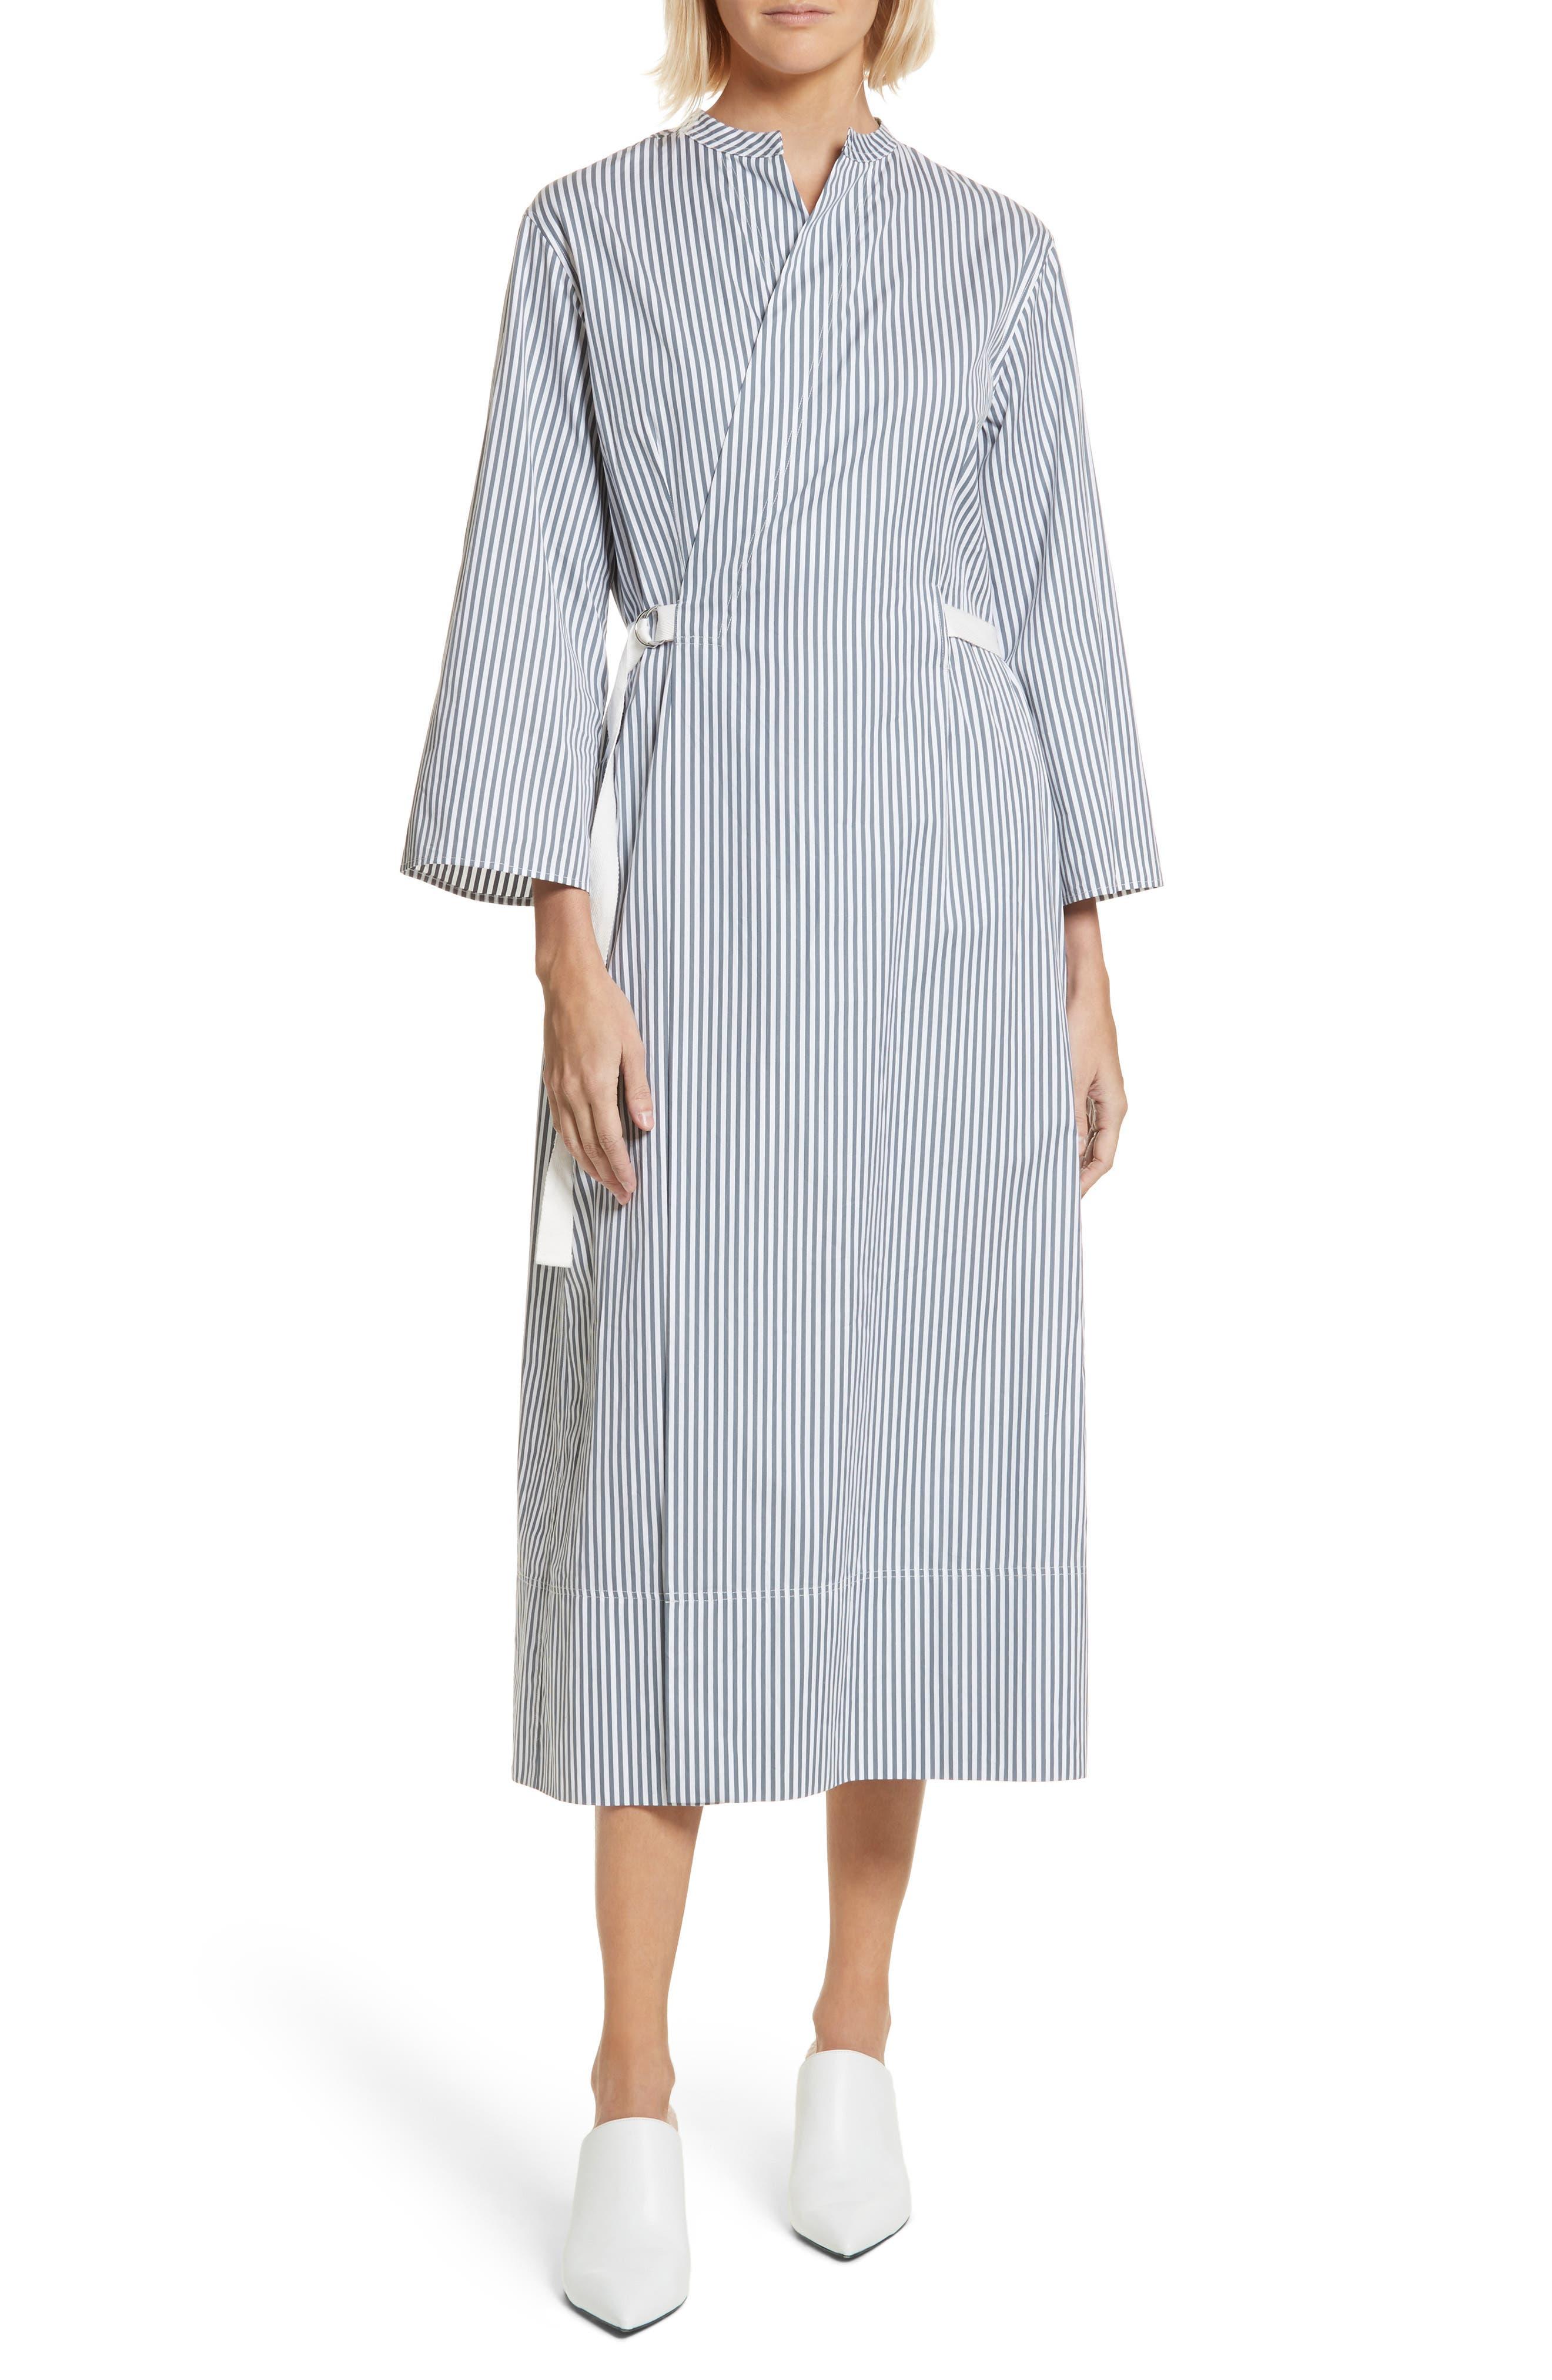 Candy Stripe Midi Dress,                             Main thumbnail 1, color,